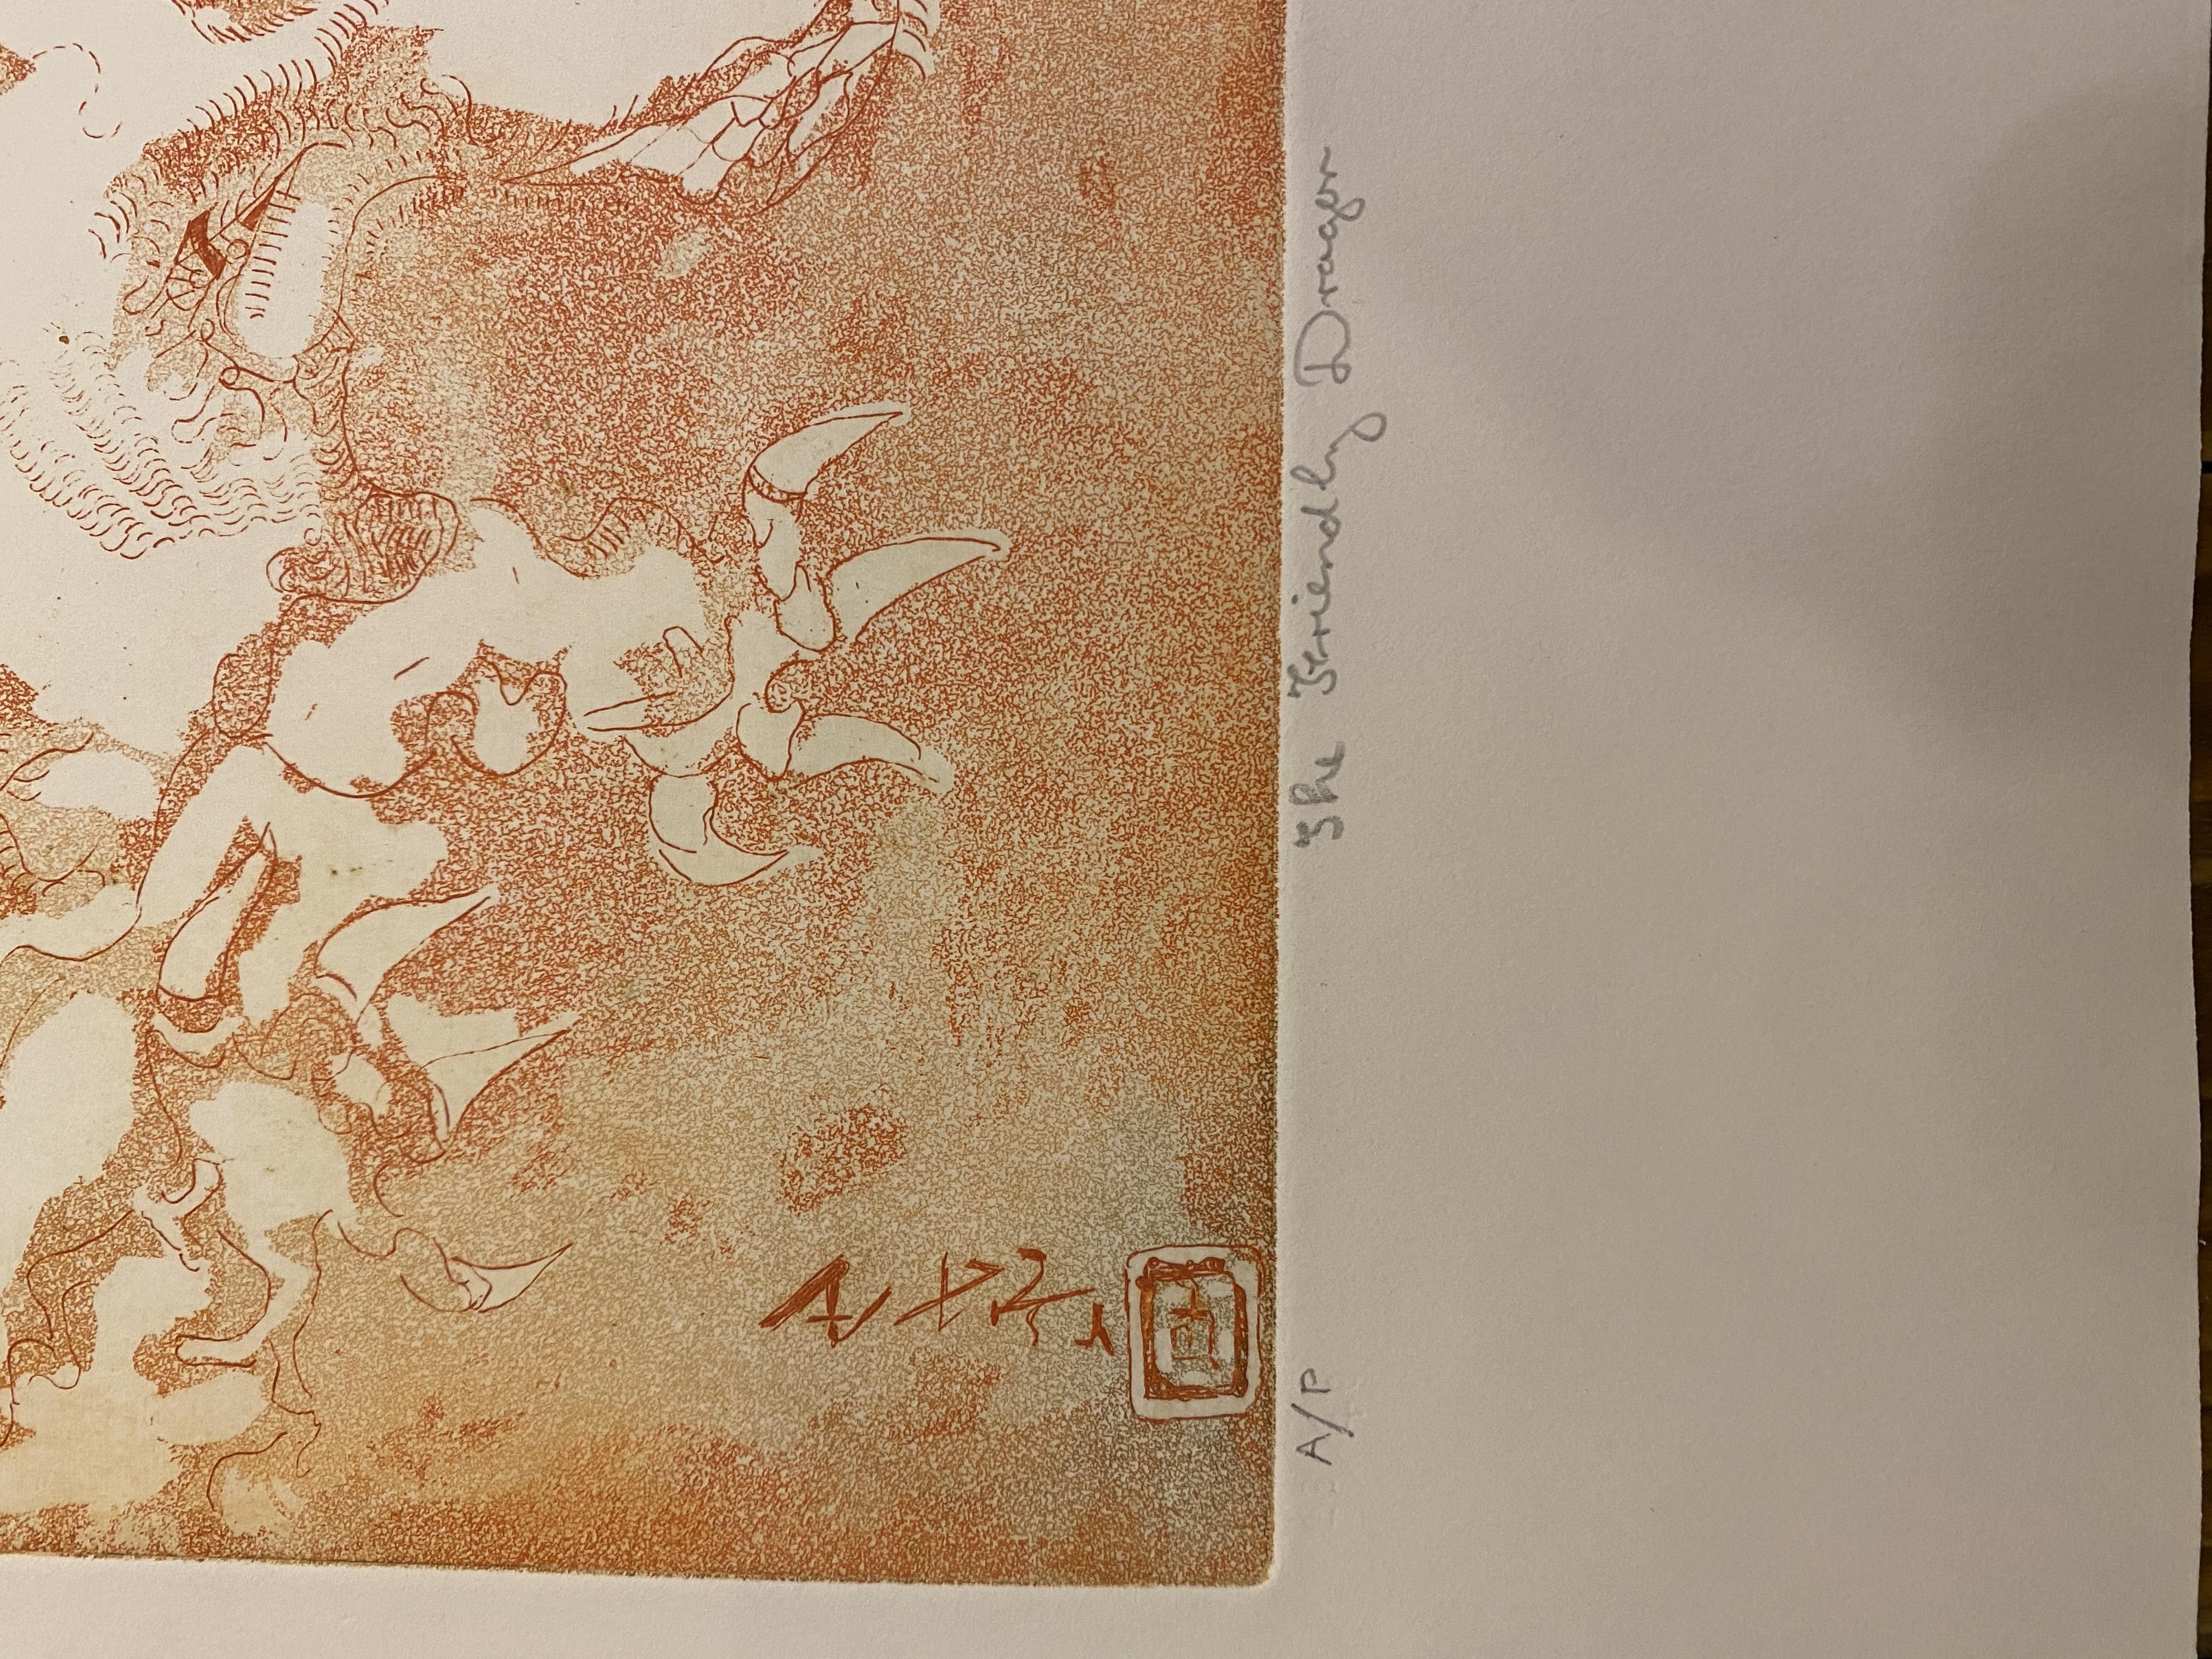 Samuel Robin Spark, The Friendly Dragon Artist Proof Print 91/92 - Image 2 of 2